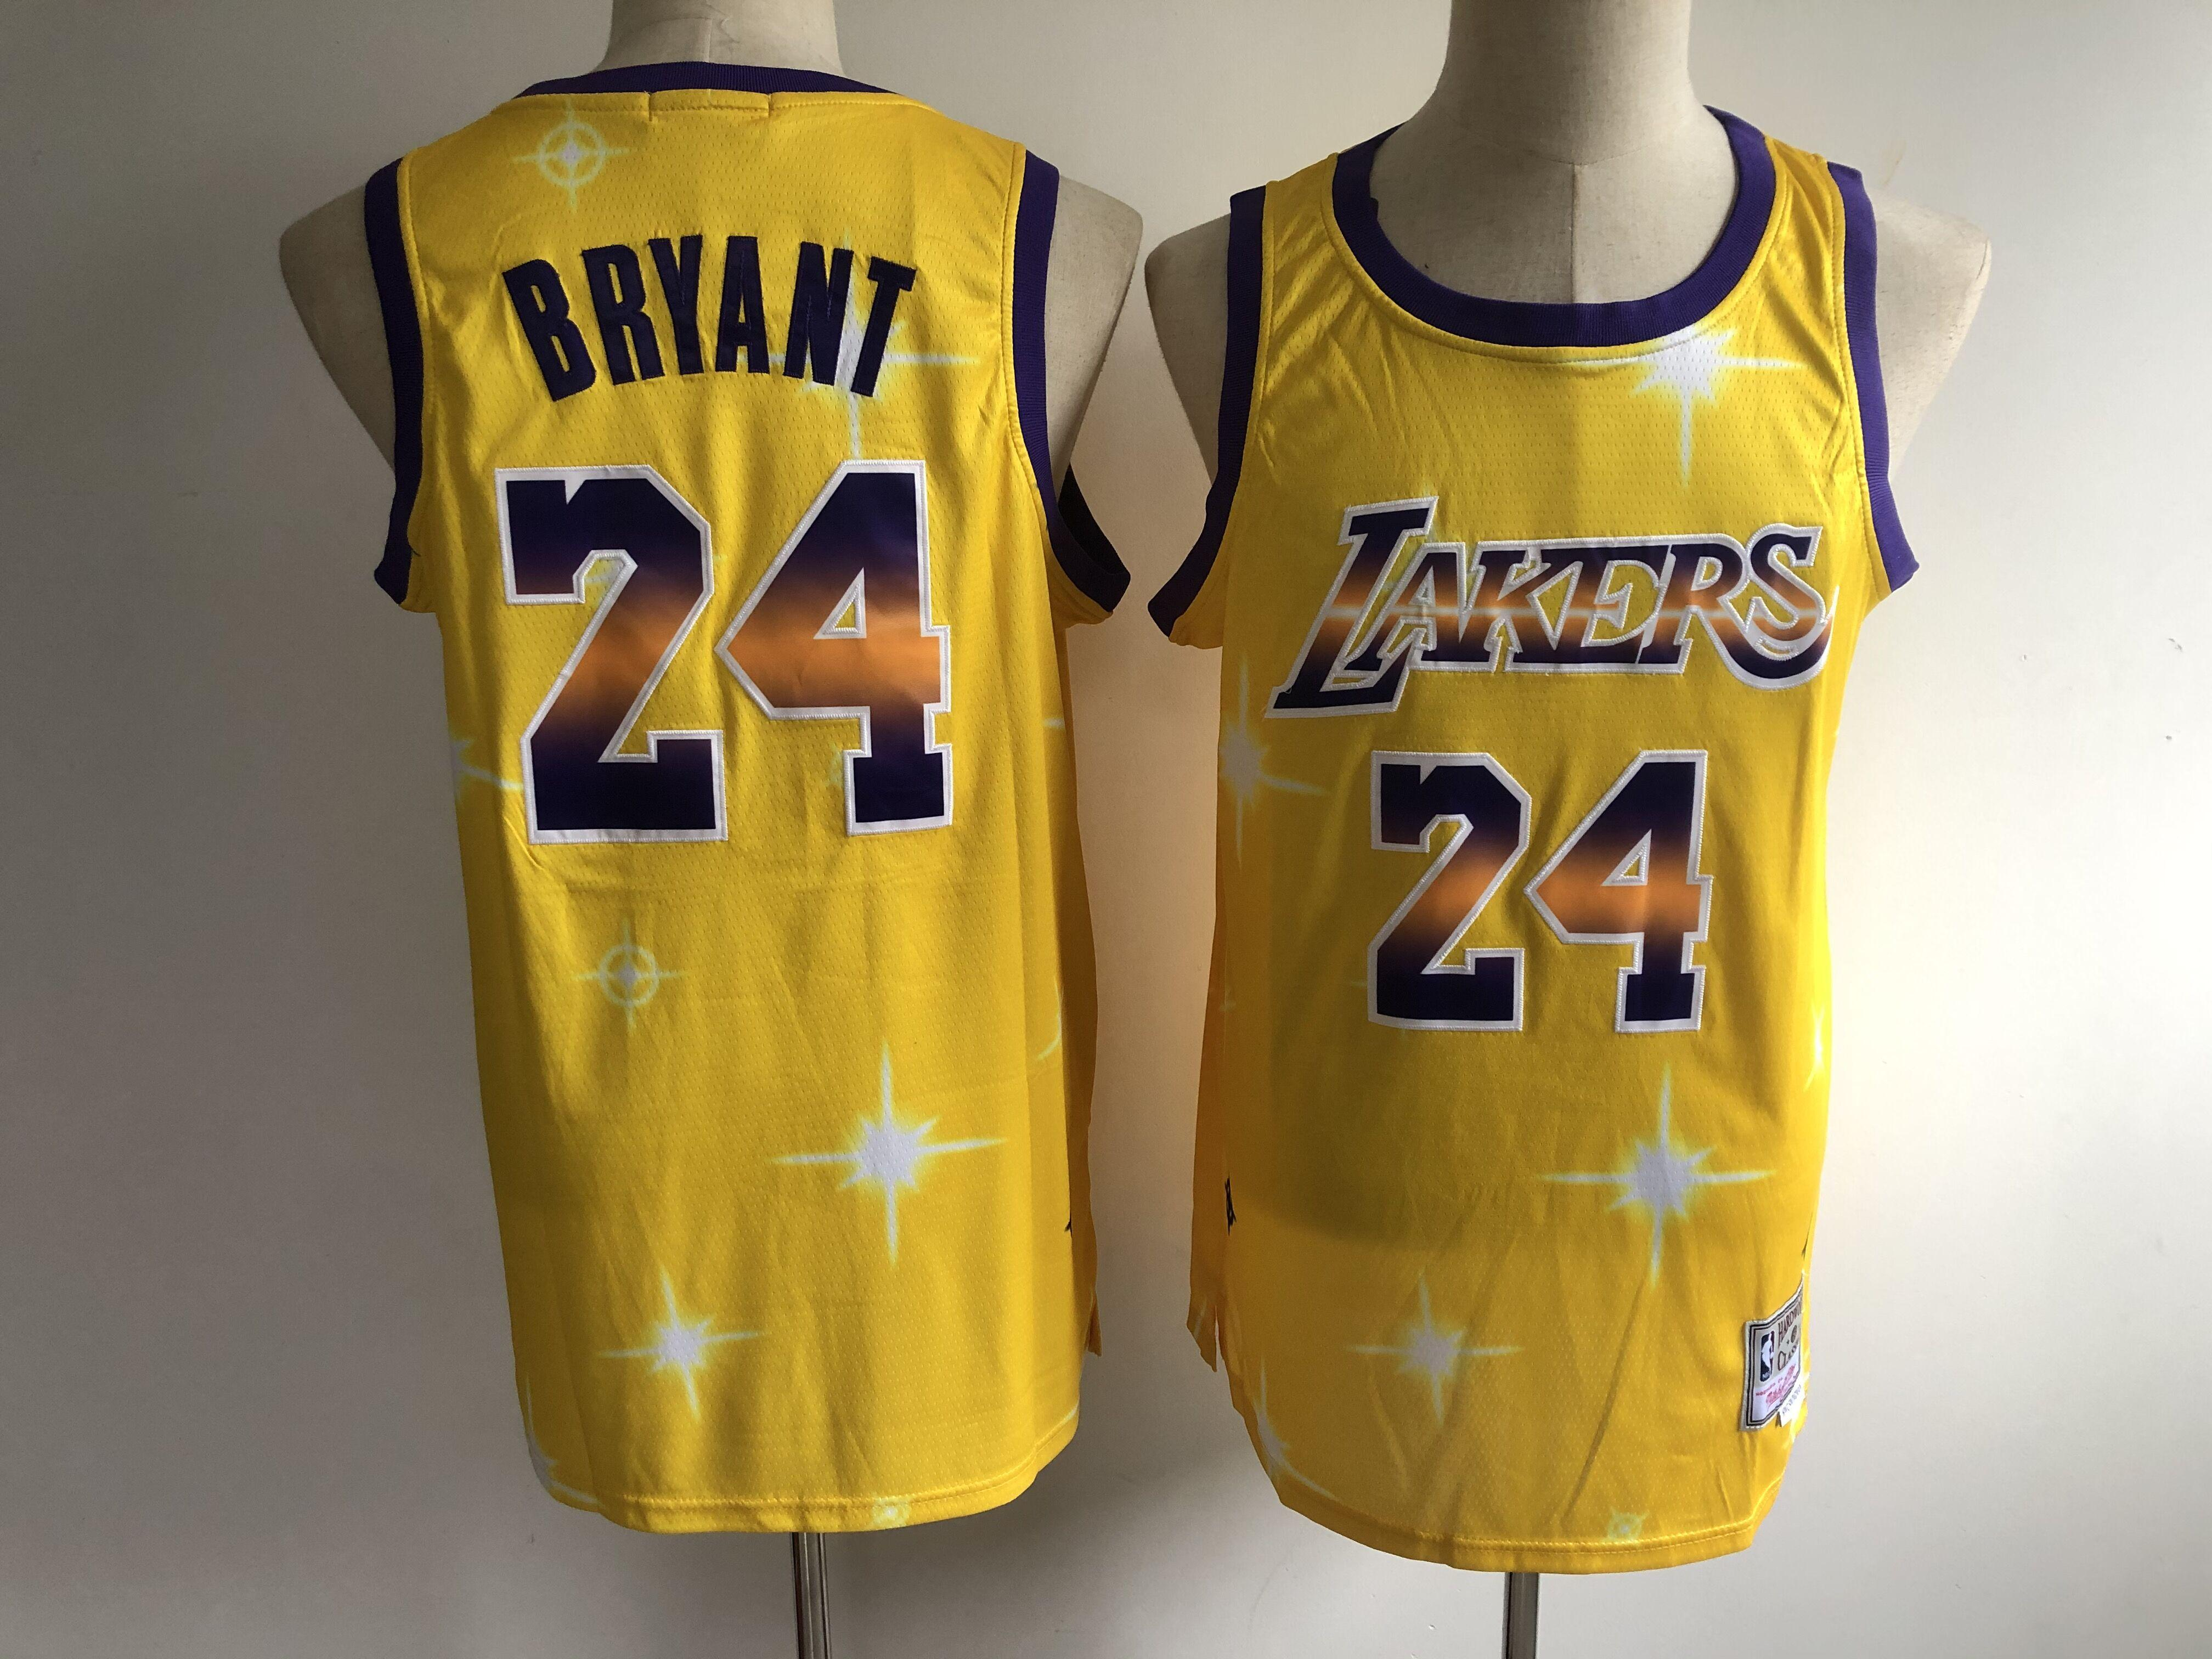 2021 2020 Men Retro Fashion Raptors Lakers 23 Bulls James 24 Bryant 15  Carter 32 Hardaway Star Embroidery Basketball Jerseys From Linda201826,  $20.58